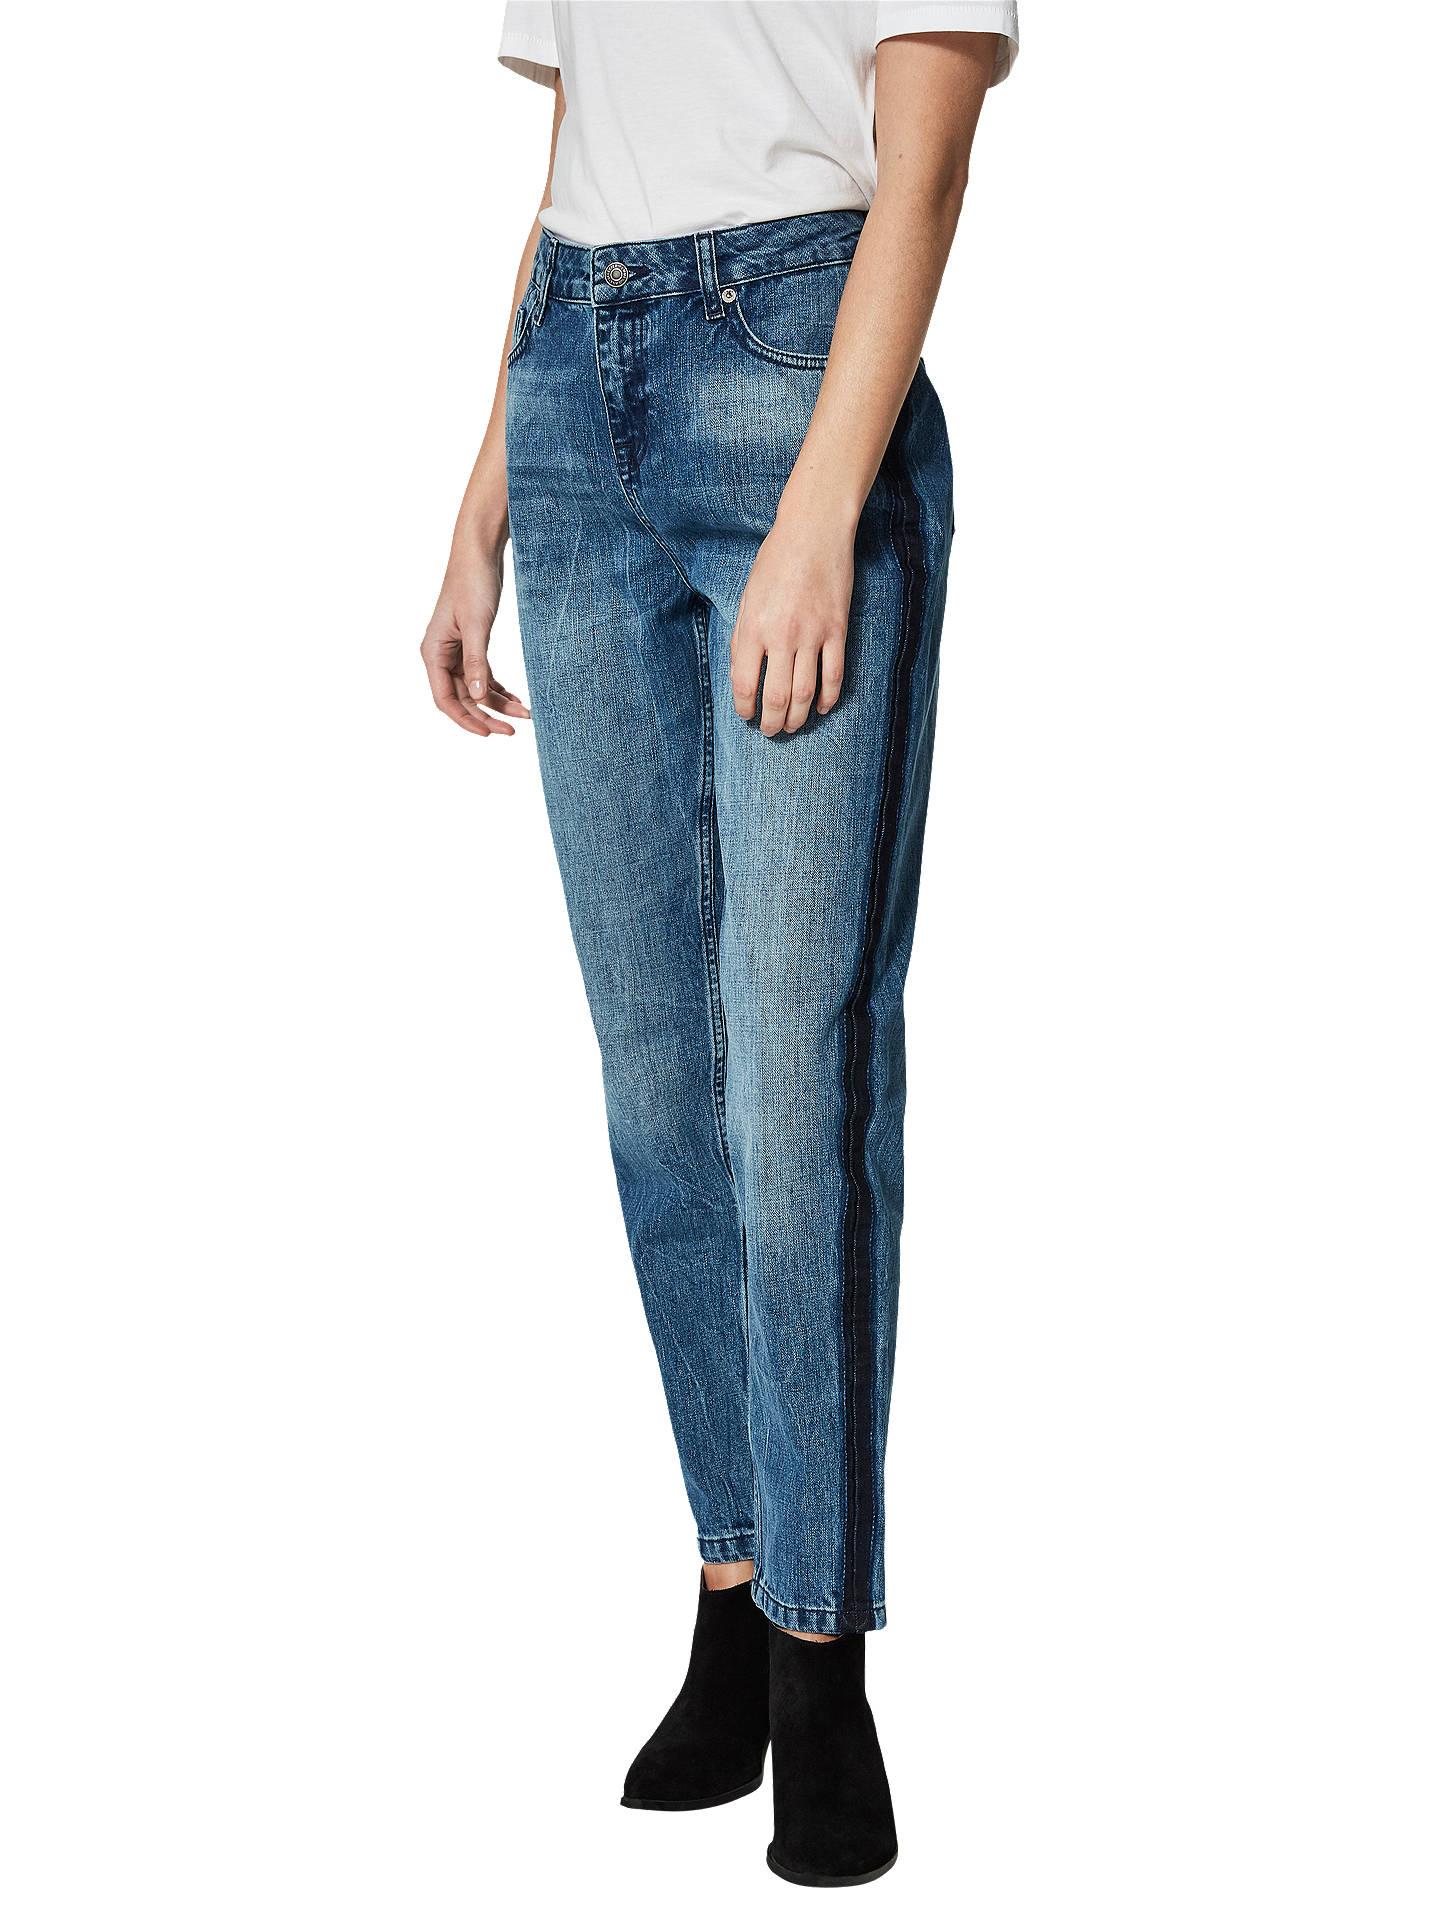 3a77f06eb5 Buy Selected Femme Roy Boyfriend Jeans, Blue Denim, 8 Online at  johnlewis.com ...